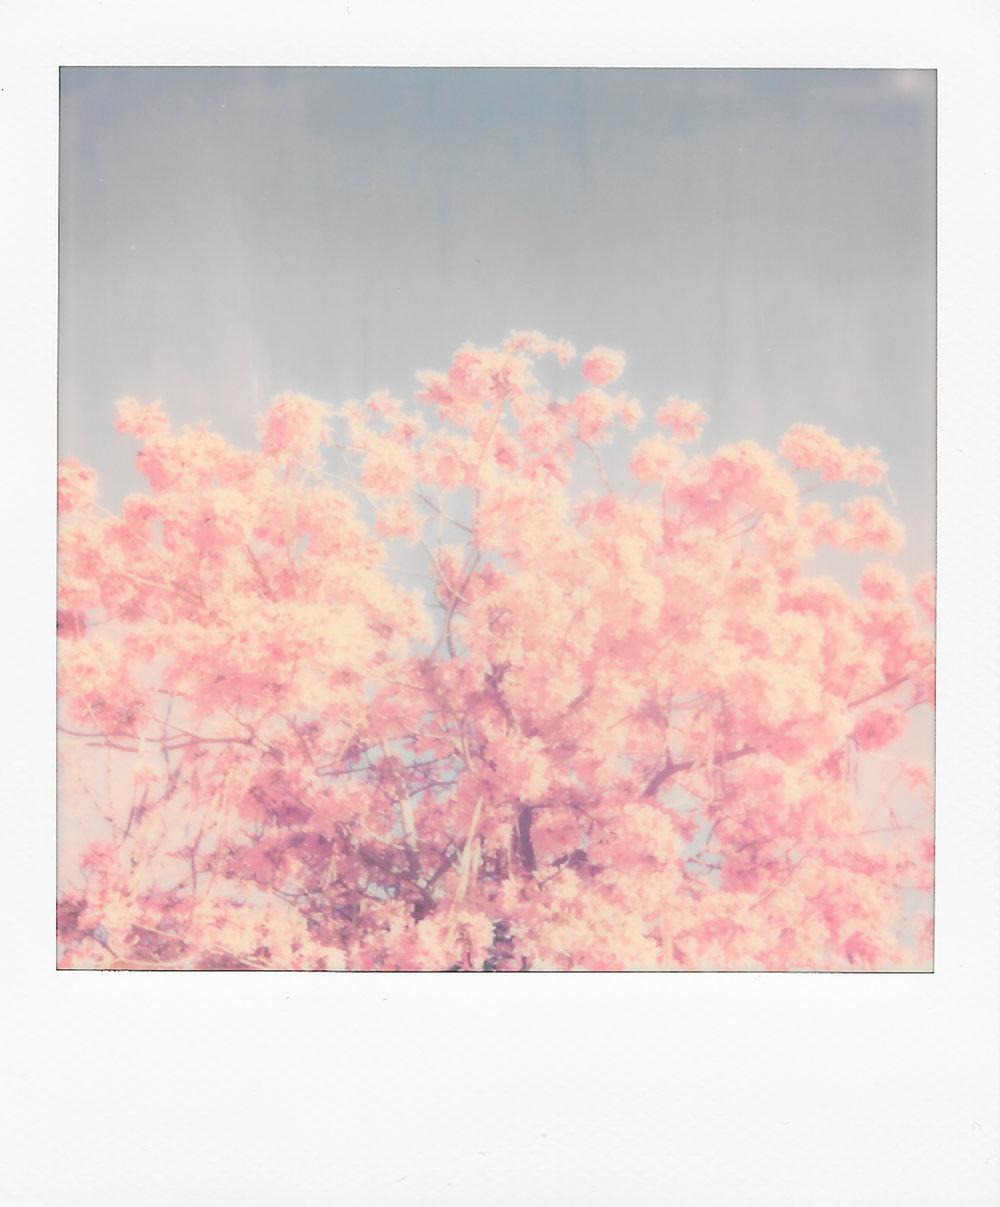 Pink Leaves | Polaroid OneStep 2 | Polaroid Color 600 | Kevan Wilkinson